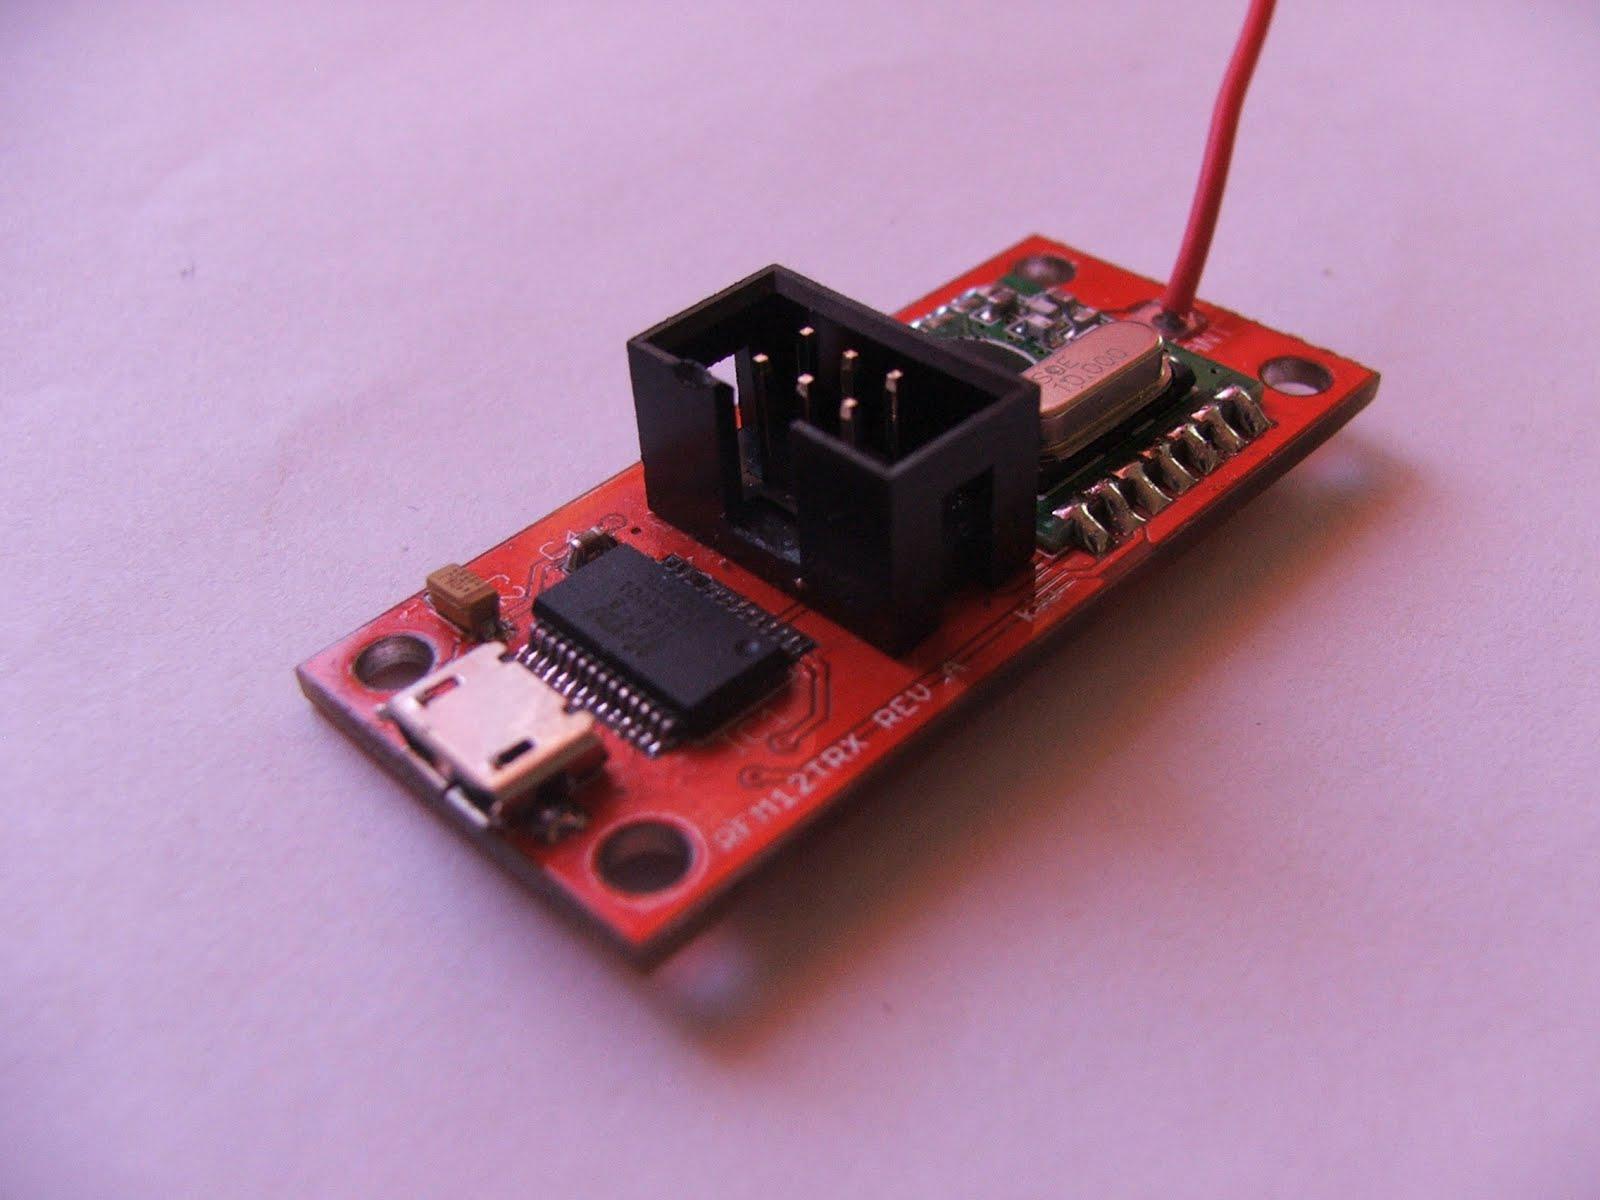 DonsDeals Blog: A simple RFM12 433Mhz Wireless Transceiver